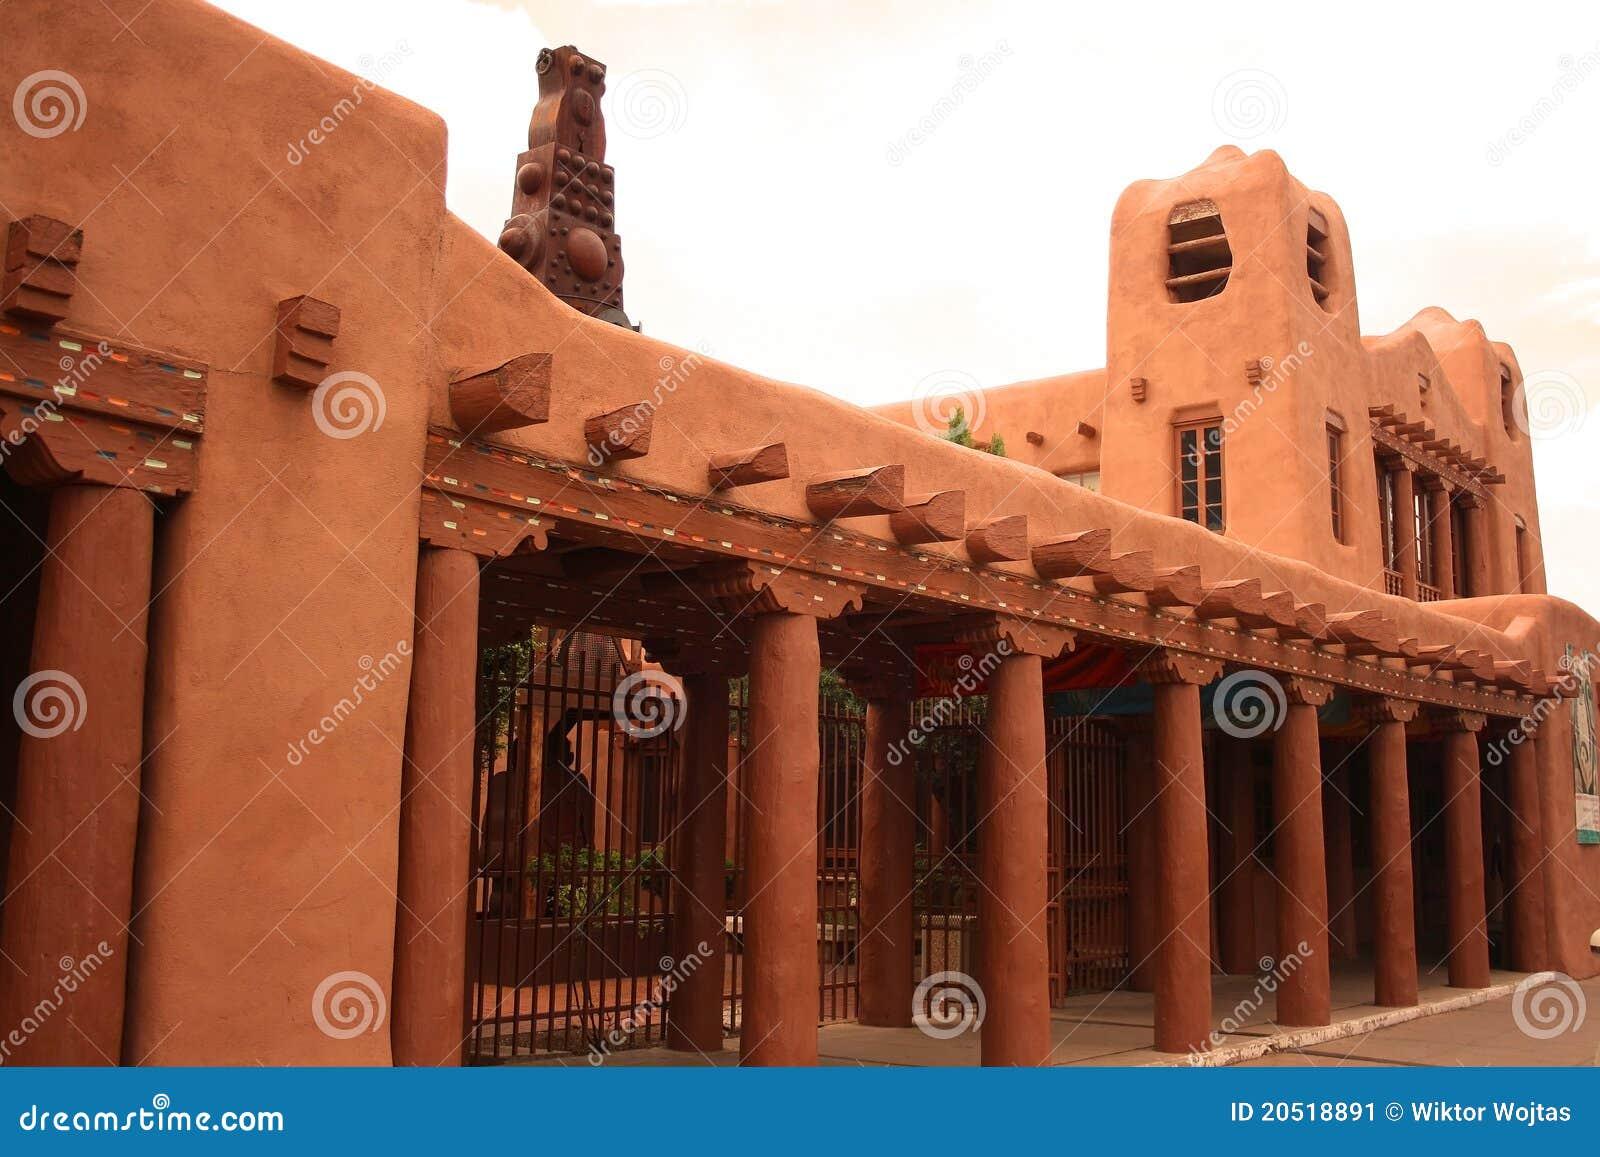 Santa fe adobe architecture stock image image 20518891 for Traditional american architecture